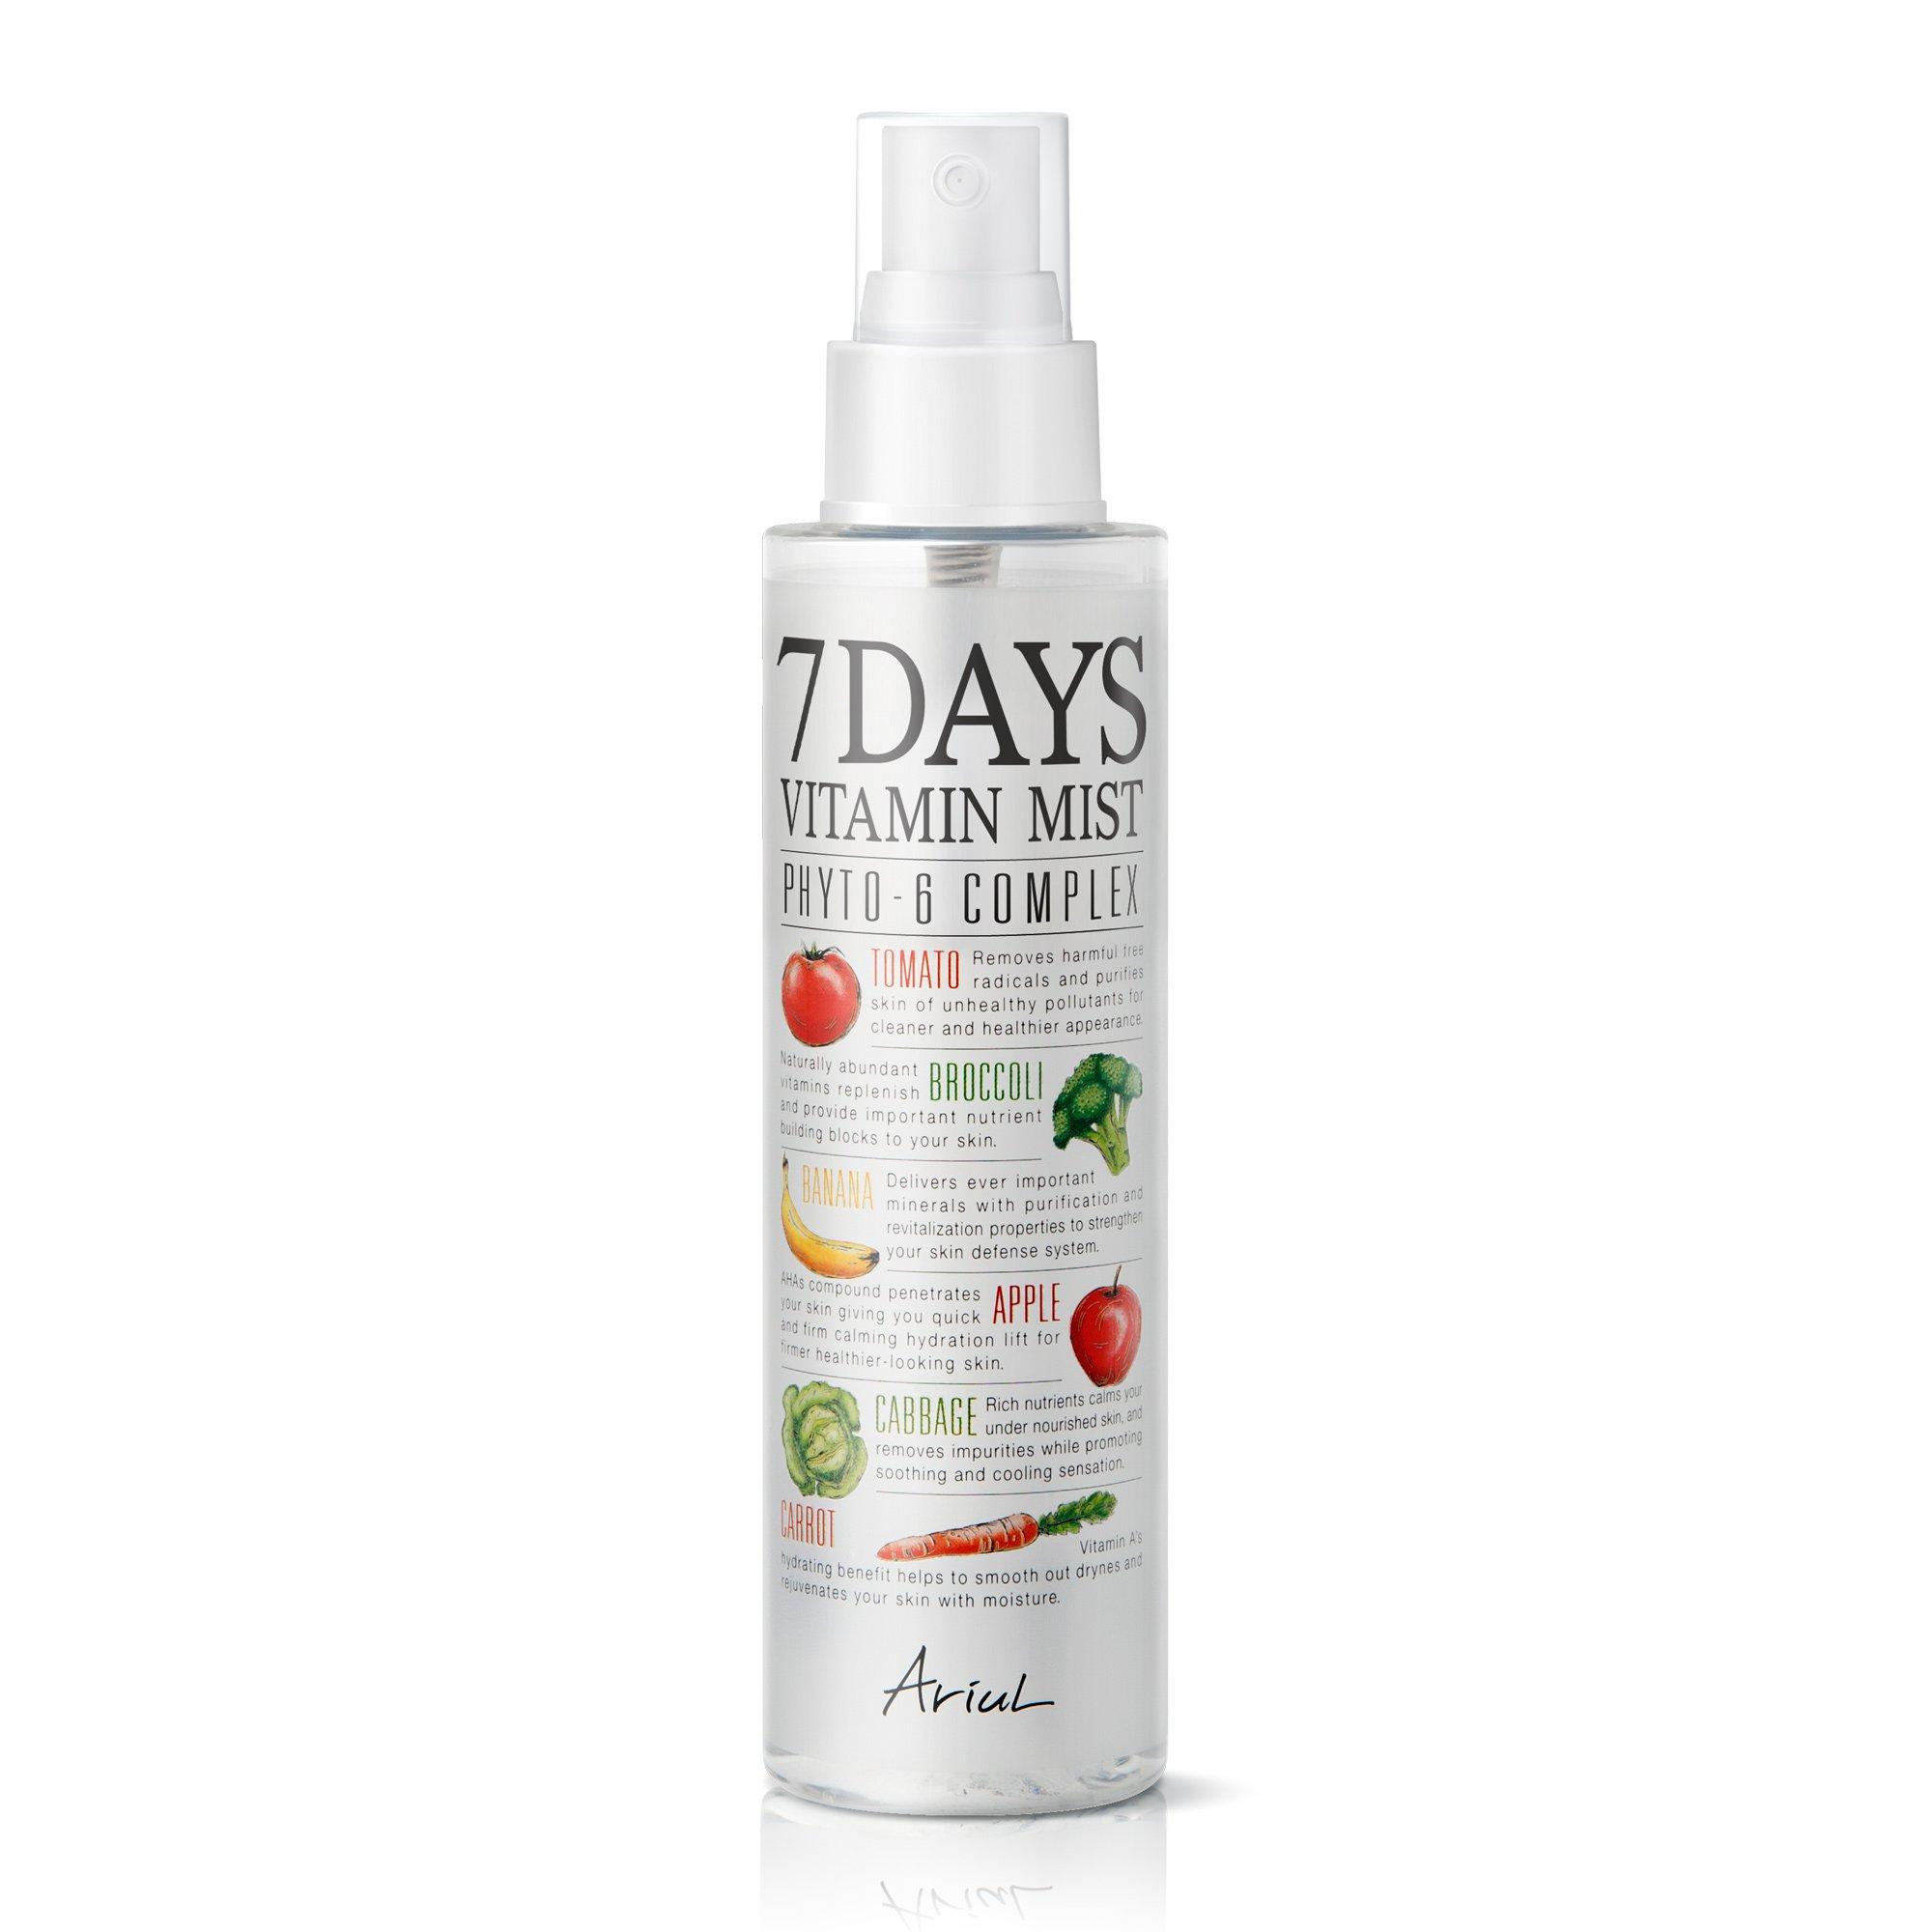 Ariul - 7 Days Vitamin Mist